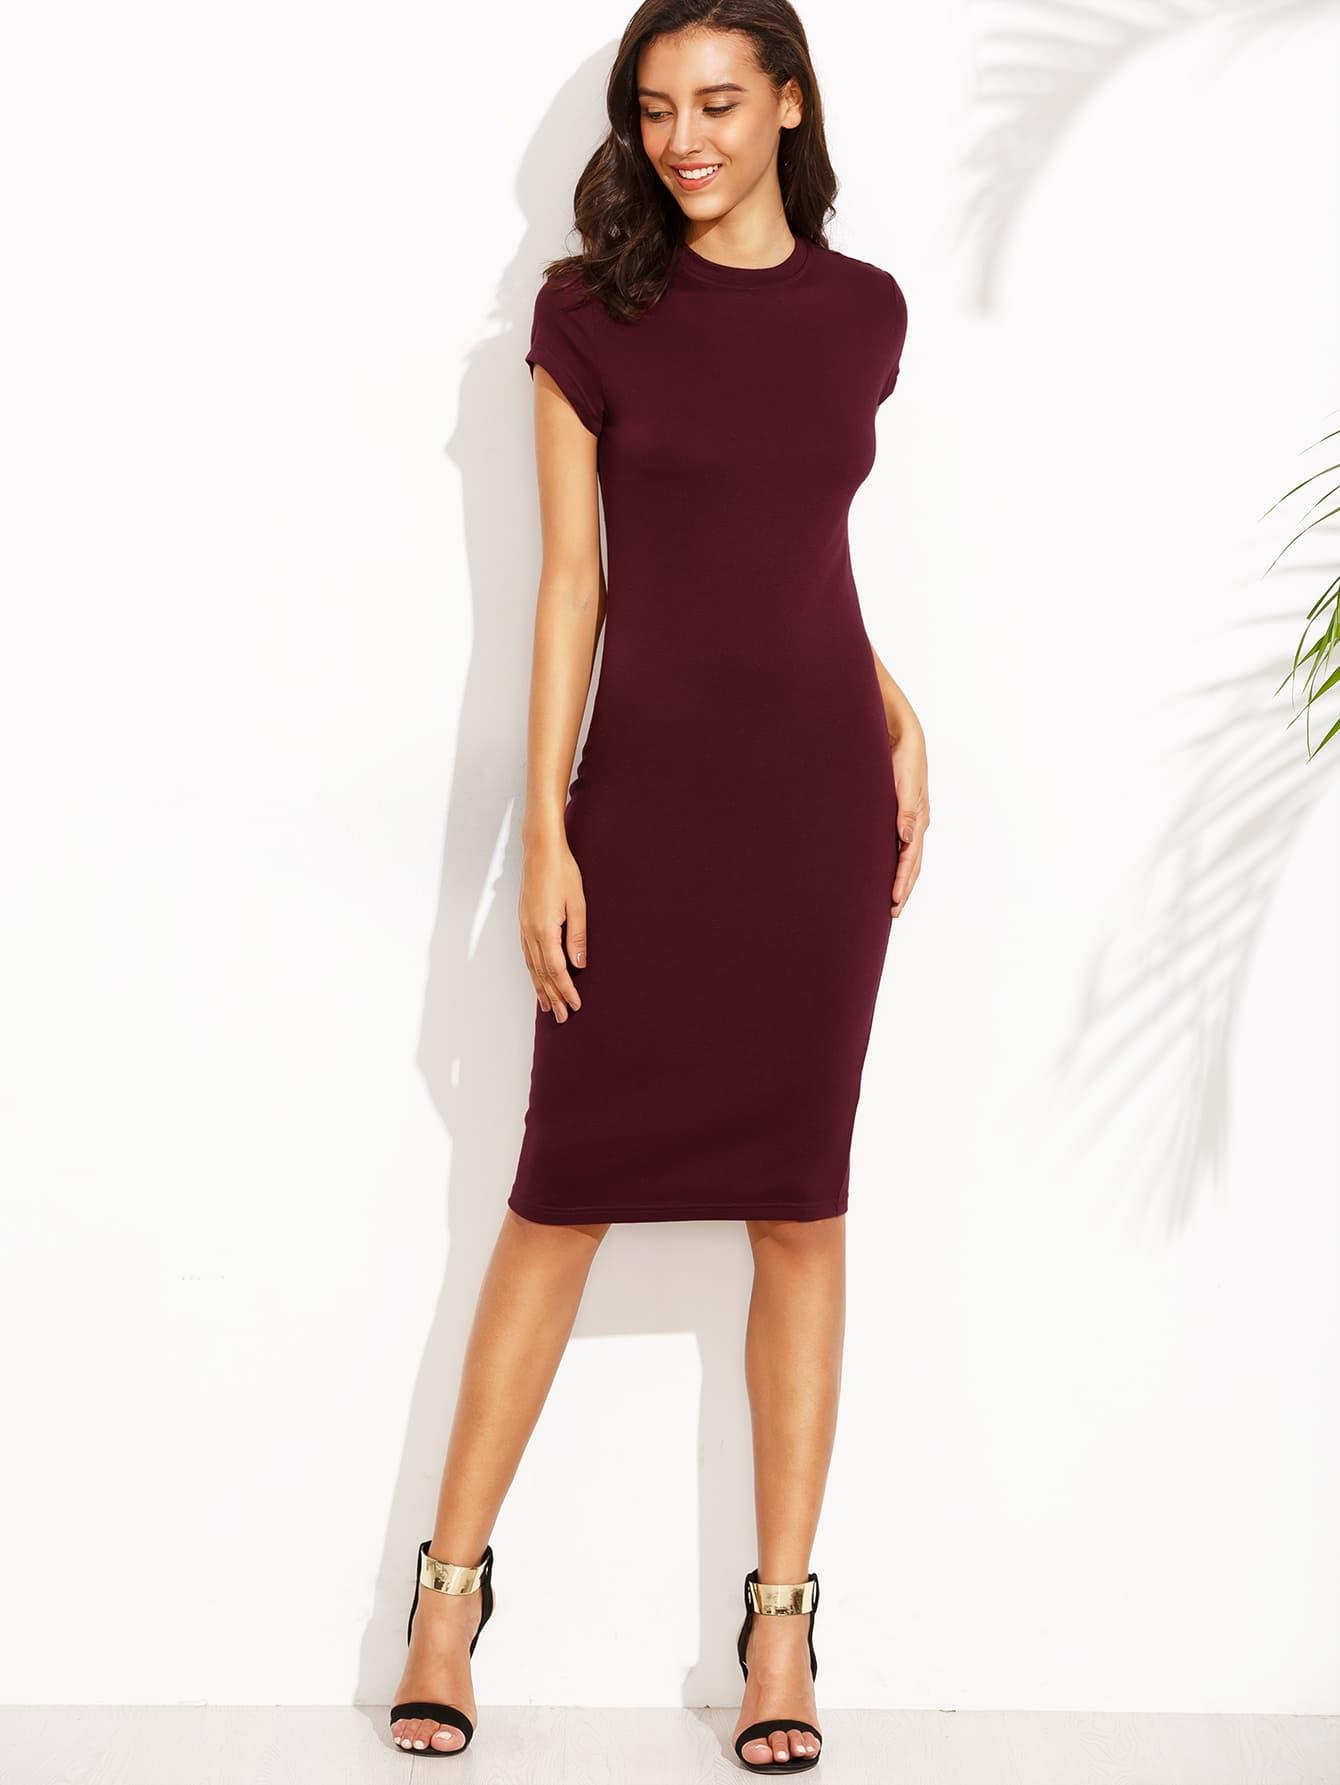 Burgundy Crew Neck Short Sleeve Sheath Dress